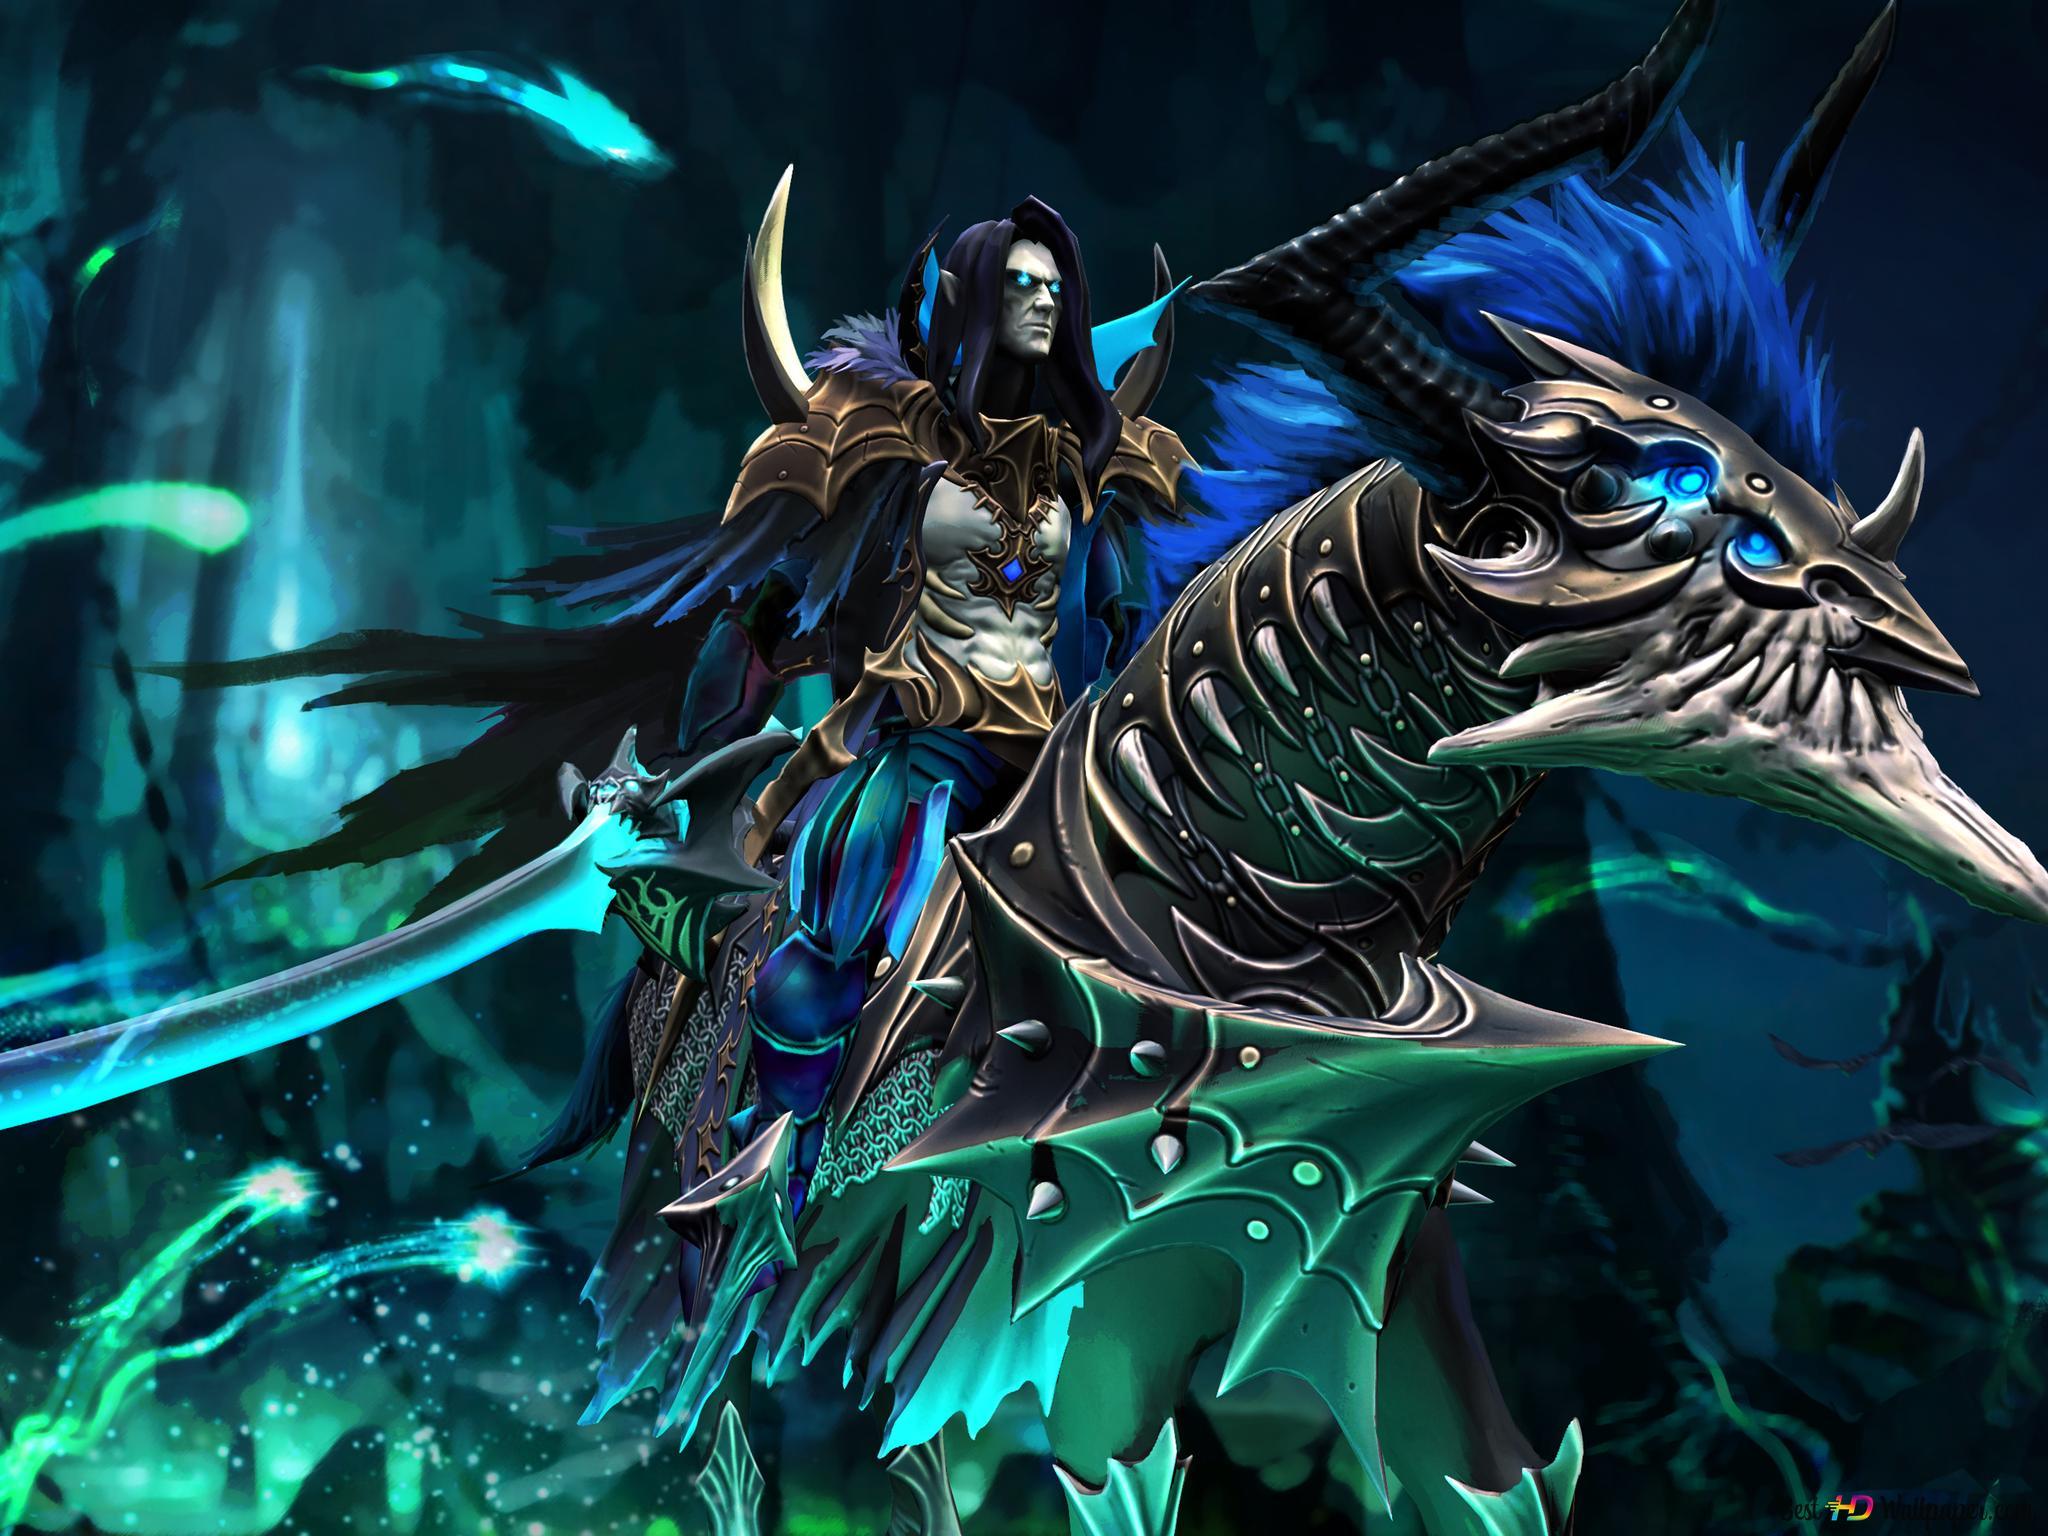 Evil Warrior from DOTA 2 HD wallpaper download